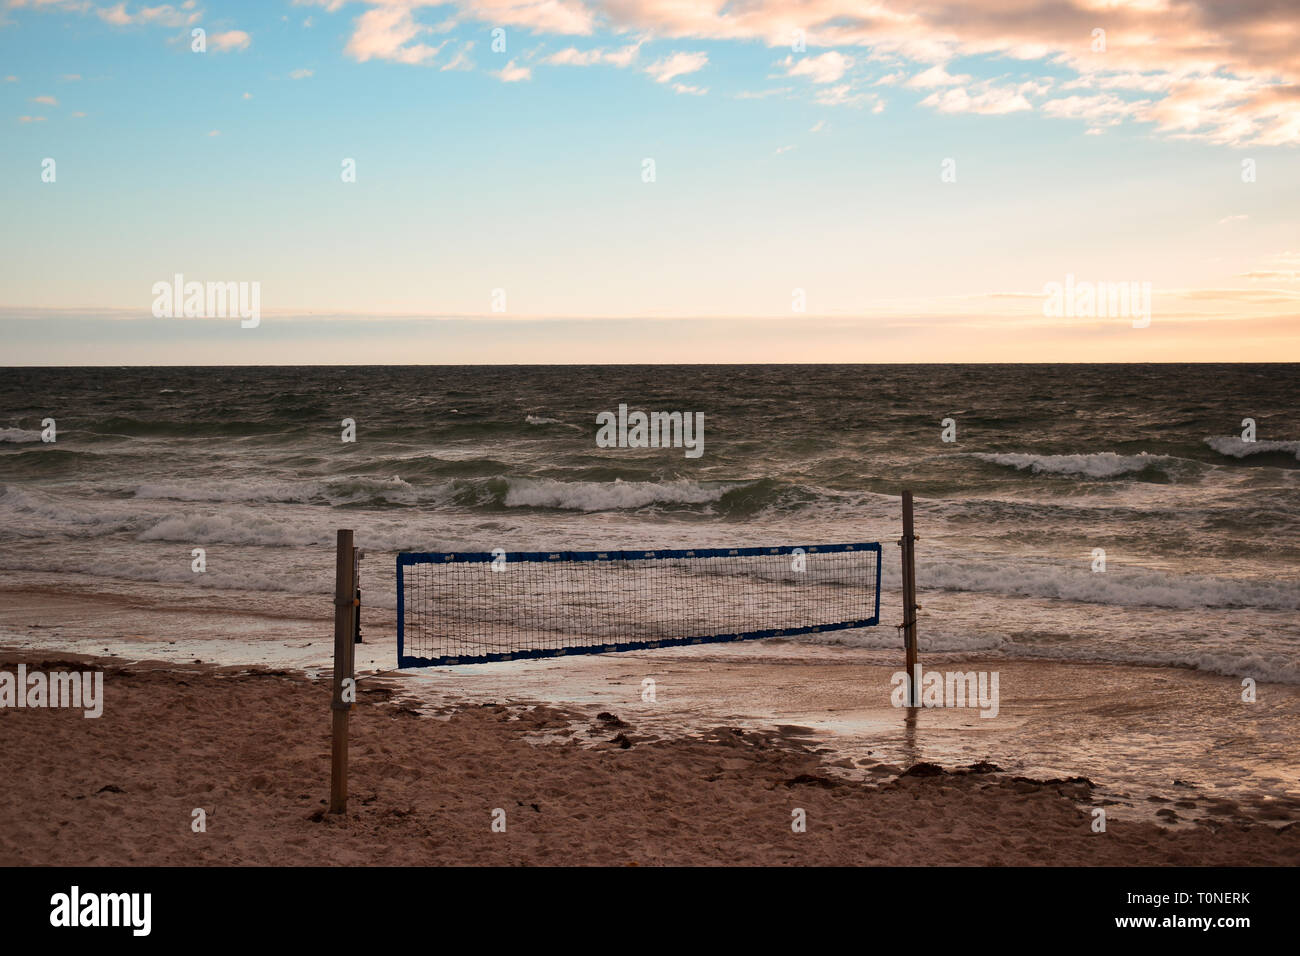 Beach volley, Henley Beach, South Australia - Stock Image